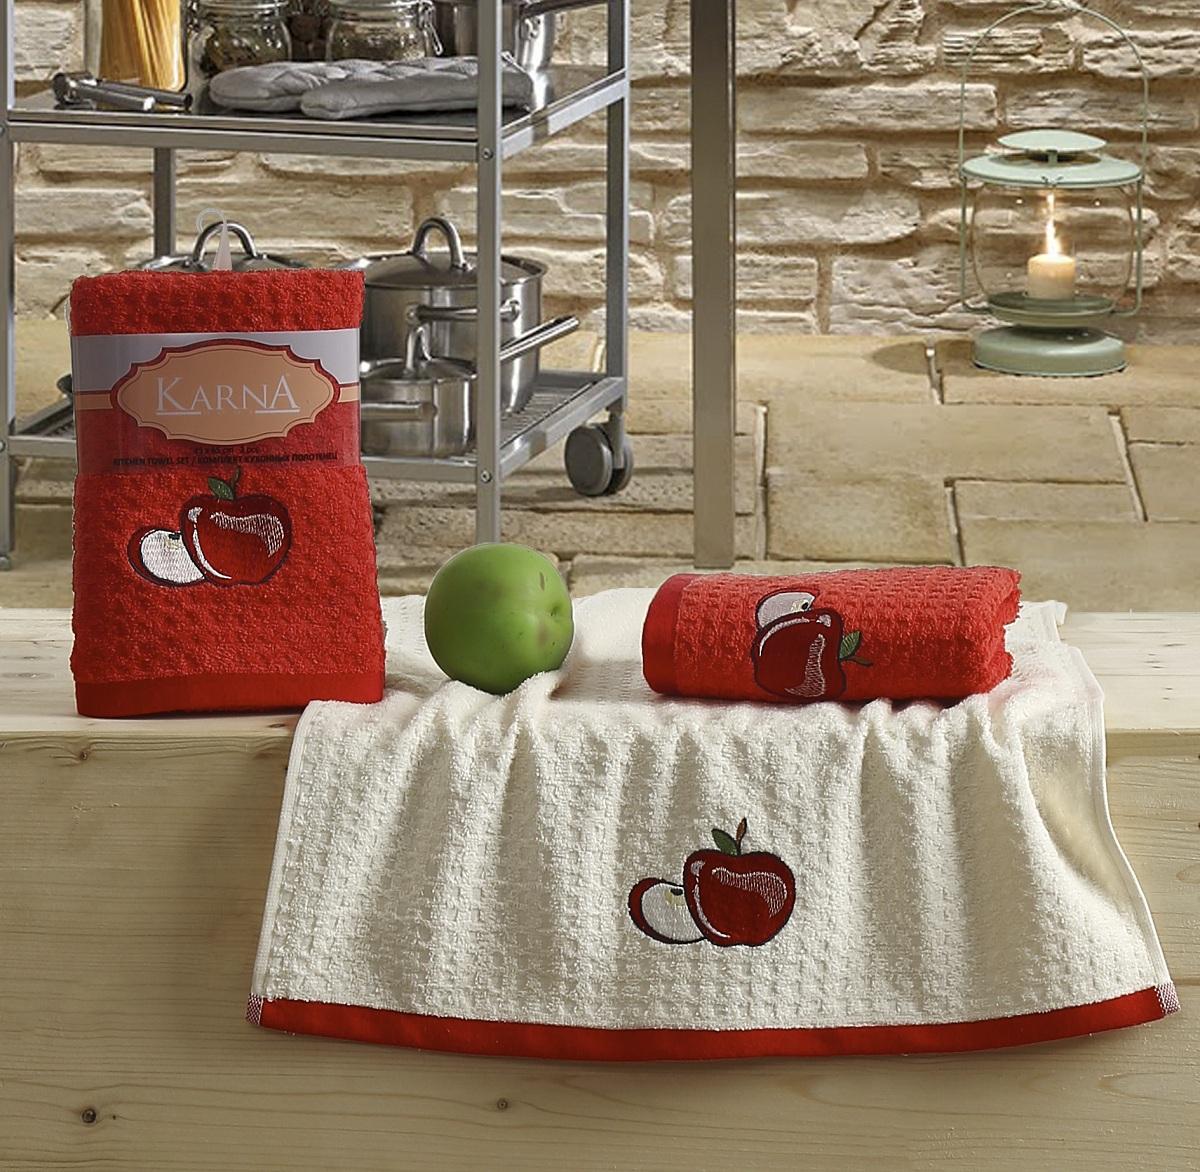 {} Karna Кухонное полотенце Lemon Цвет: Красный V1 (45х65 см - 2 шт) karna кухонное полотенце lemon цвет красный v3 45х65 см 2 шт